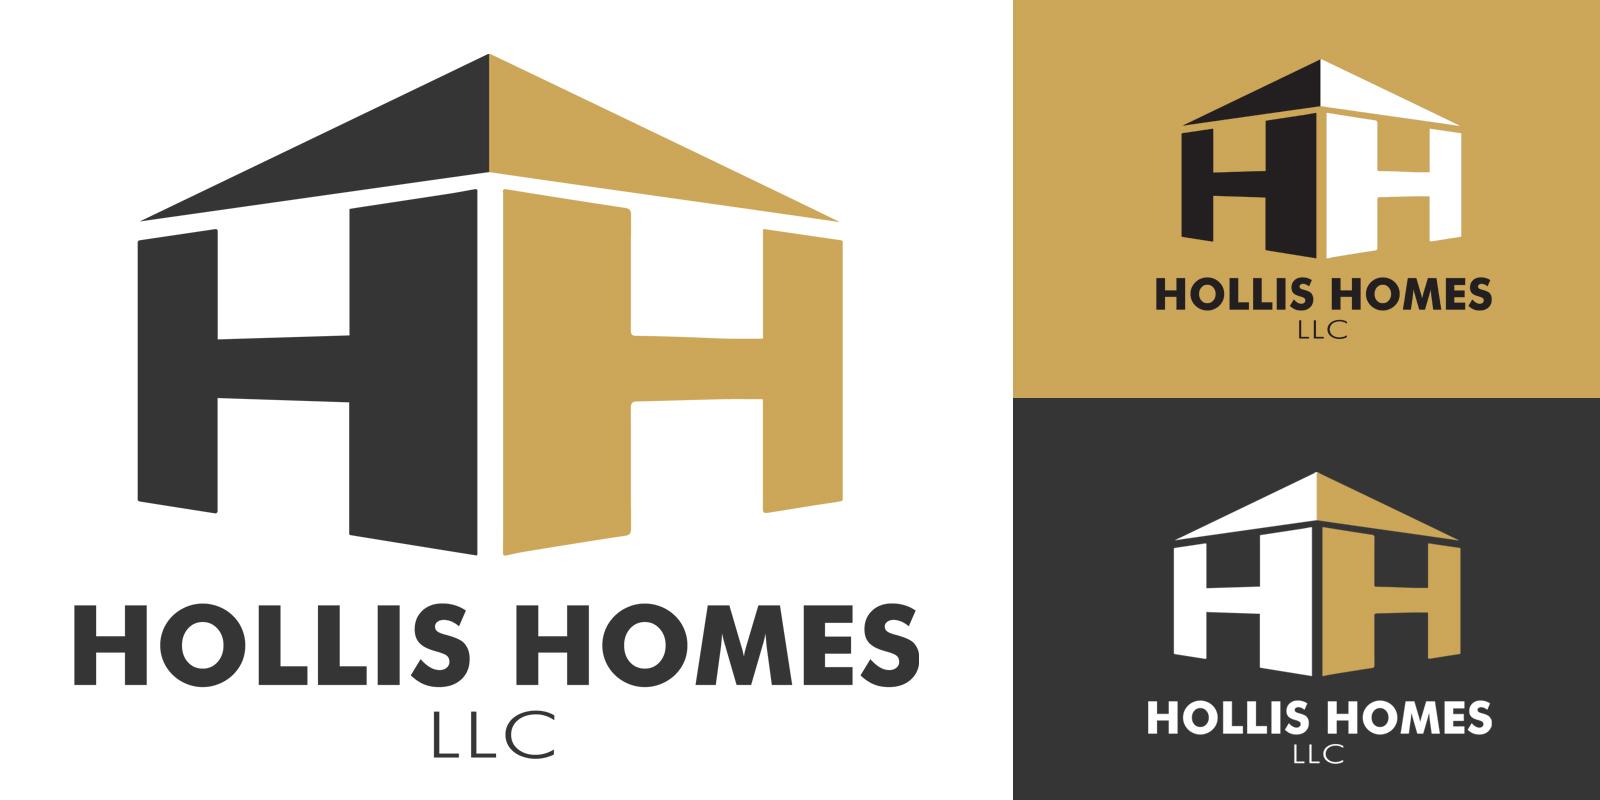 Hollis Homes logo variations